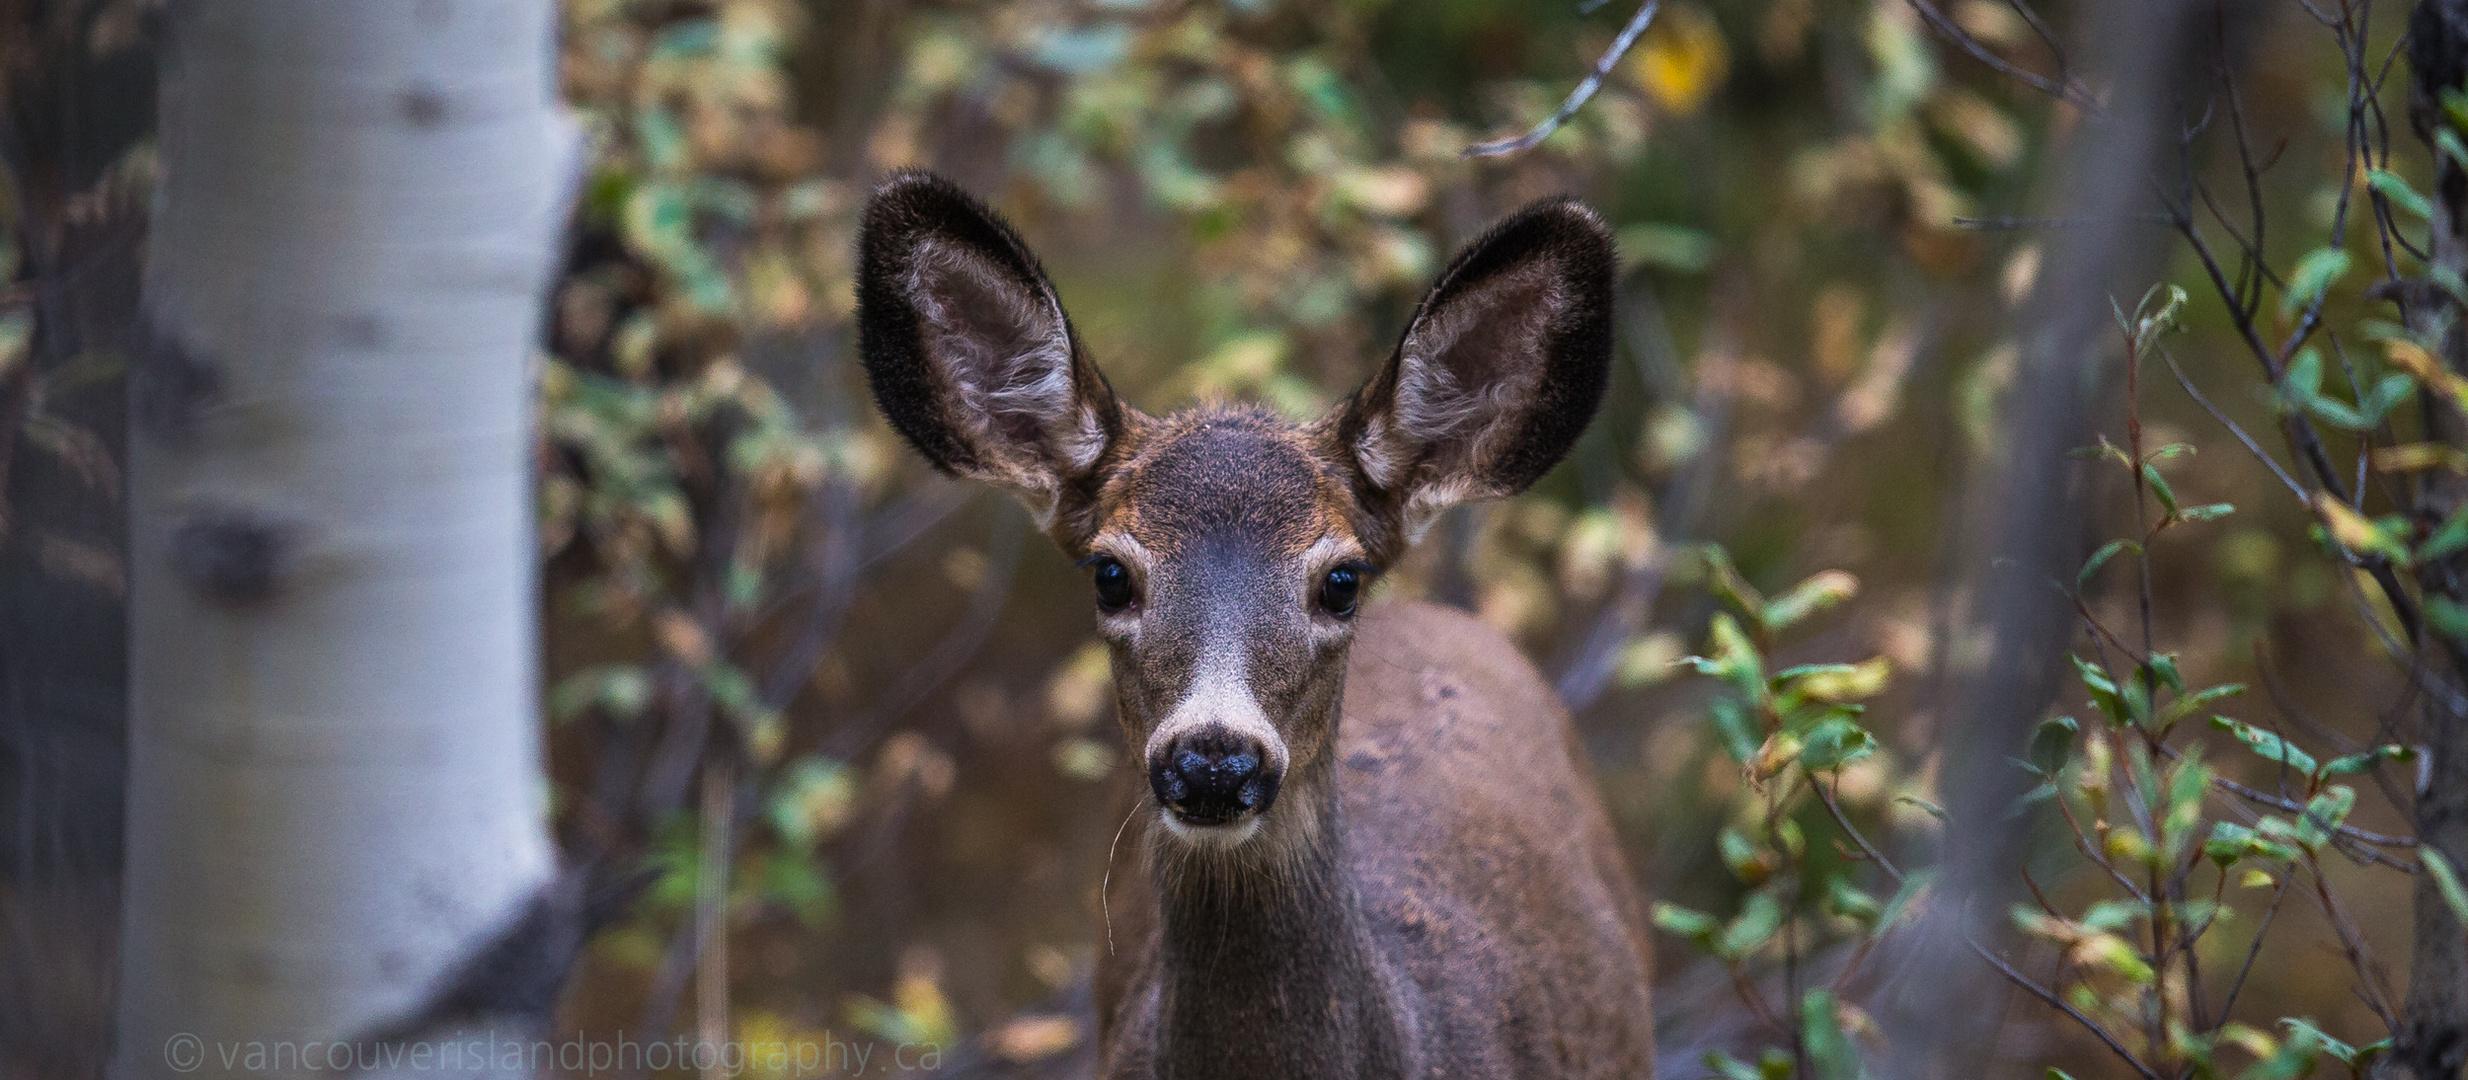 Grosse Ohren